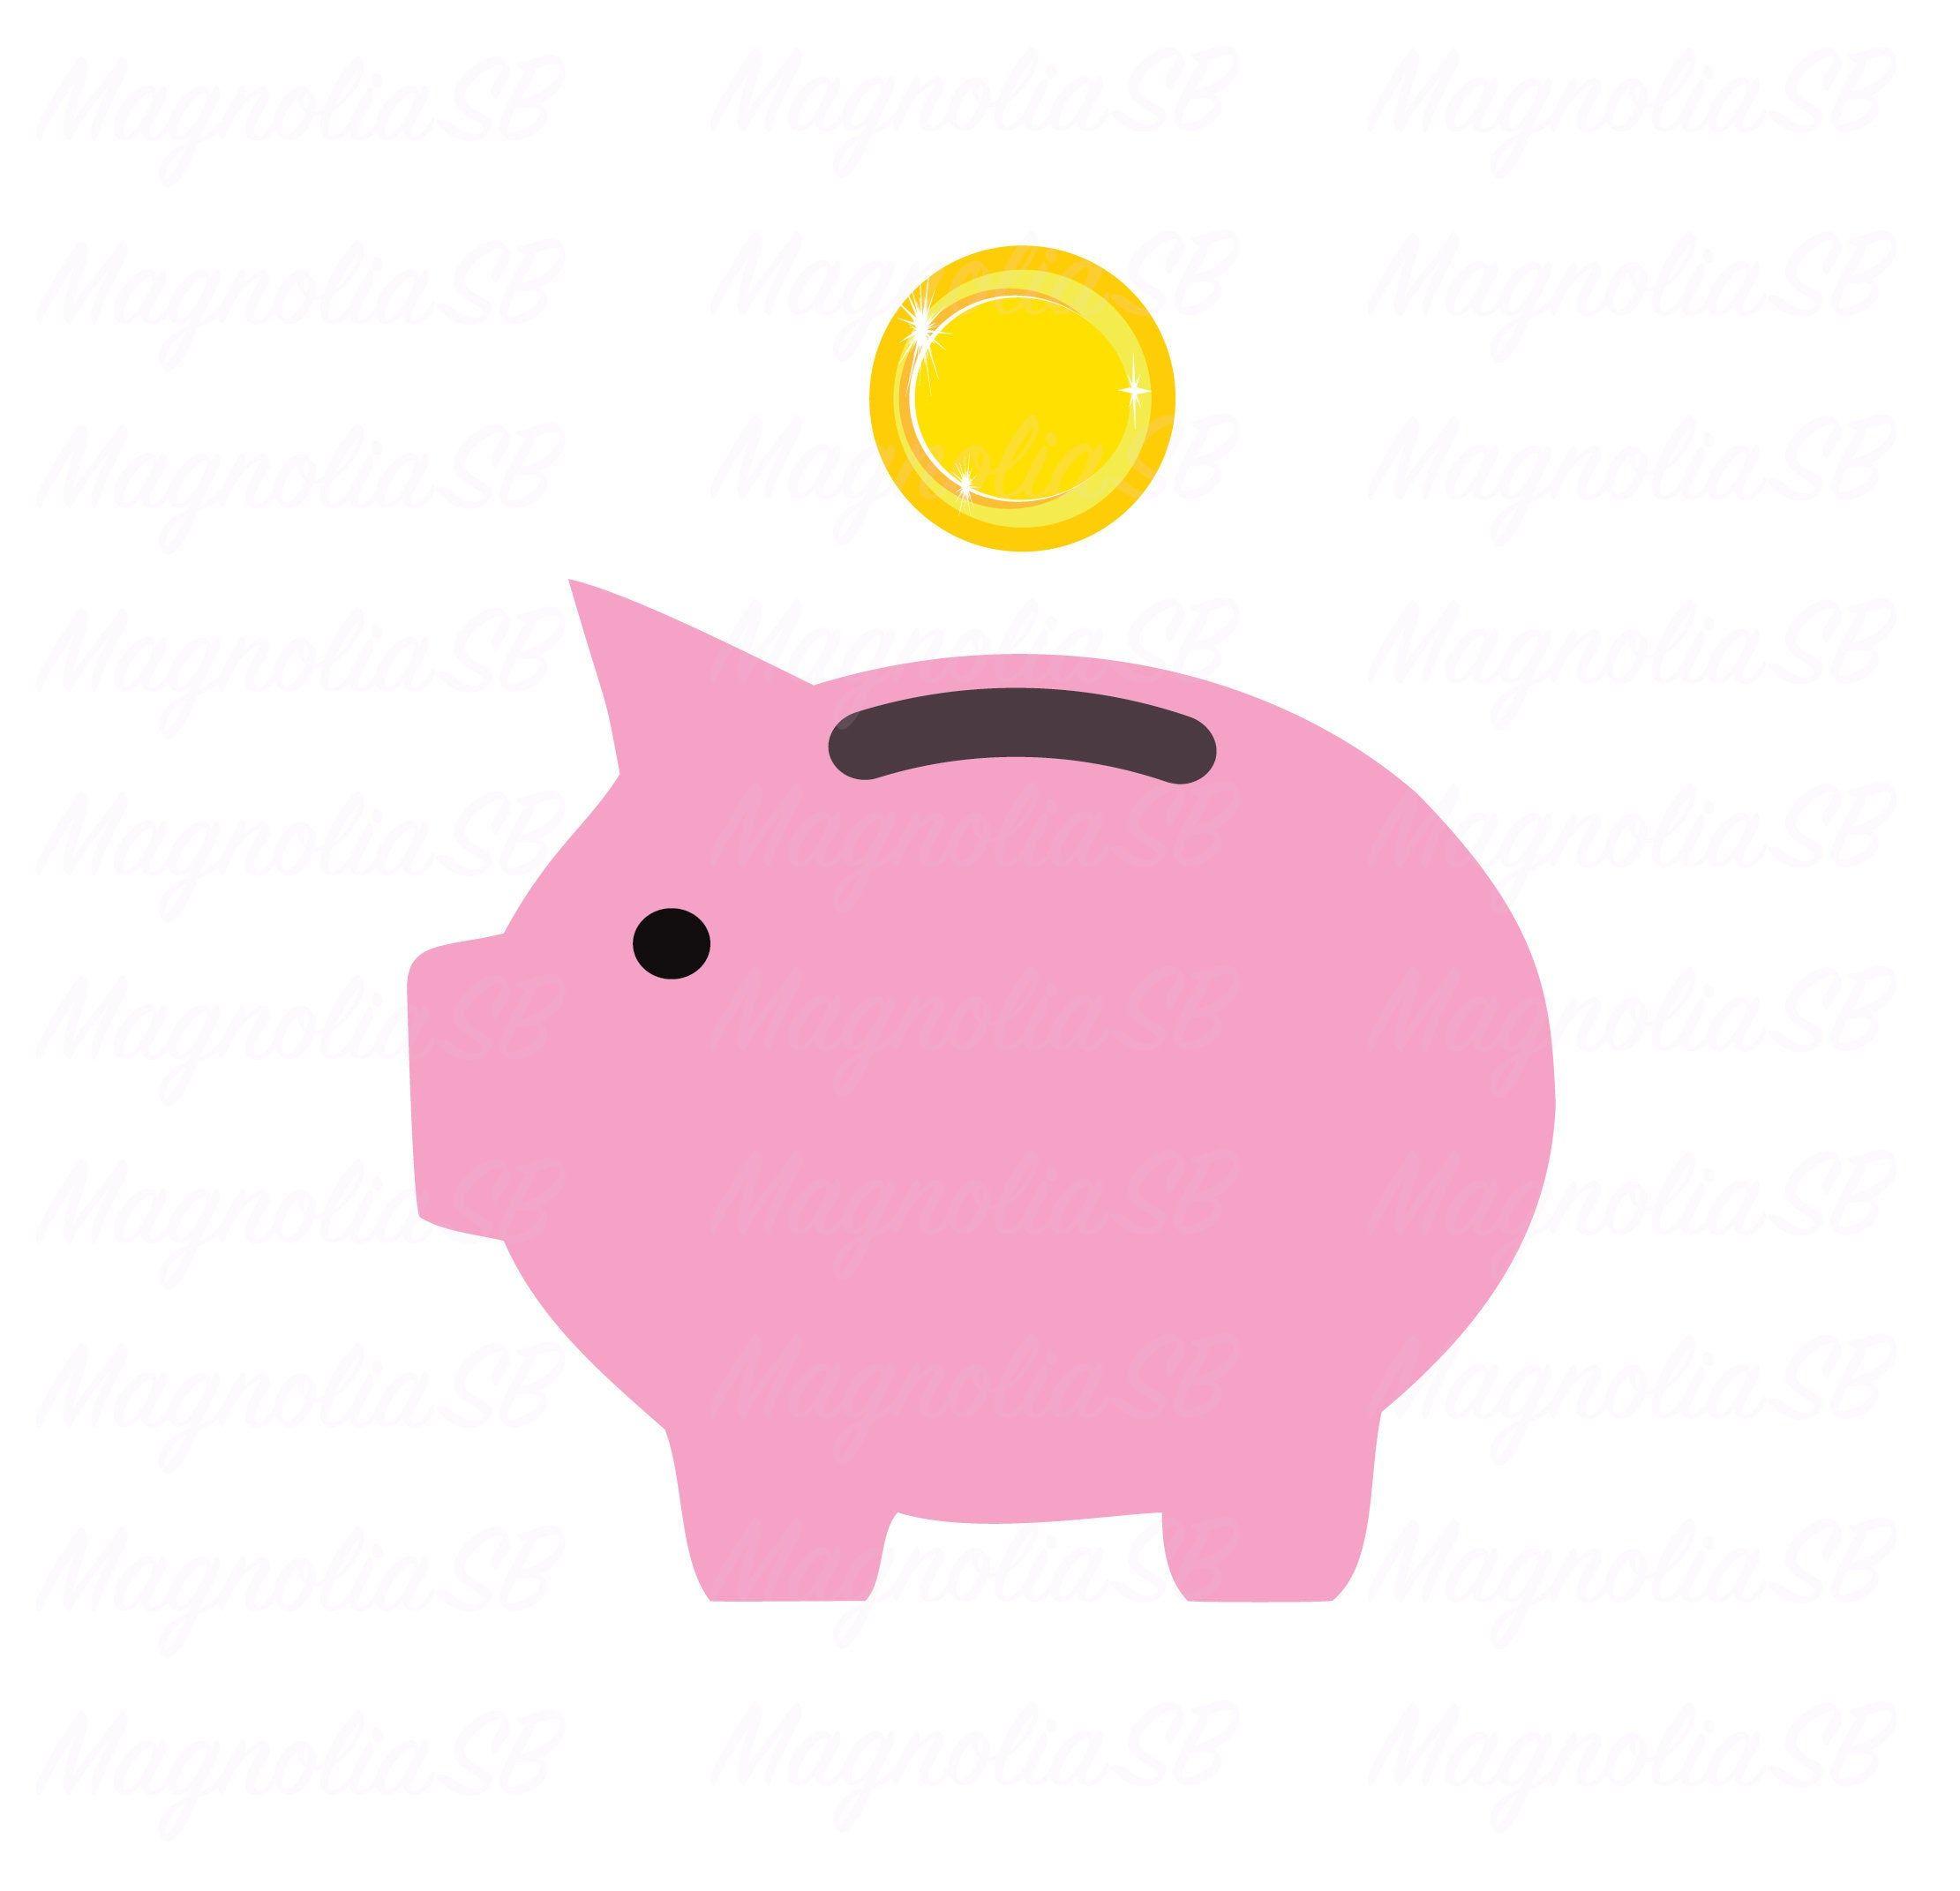 Piggy Bank Svg Dxf Clipart Cuttingmoney Golden Coin Etsy Free Printable Stationery Clip Art Piggy Bank